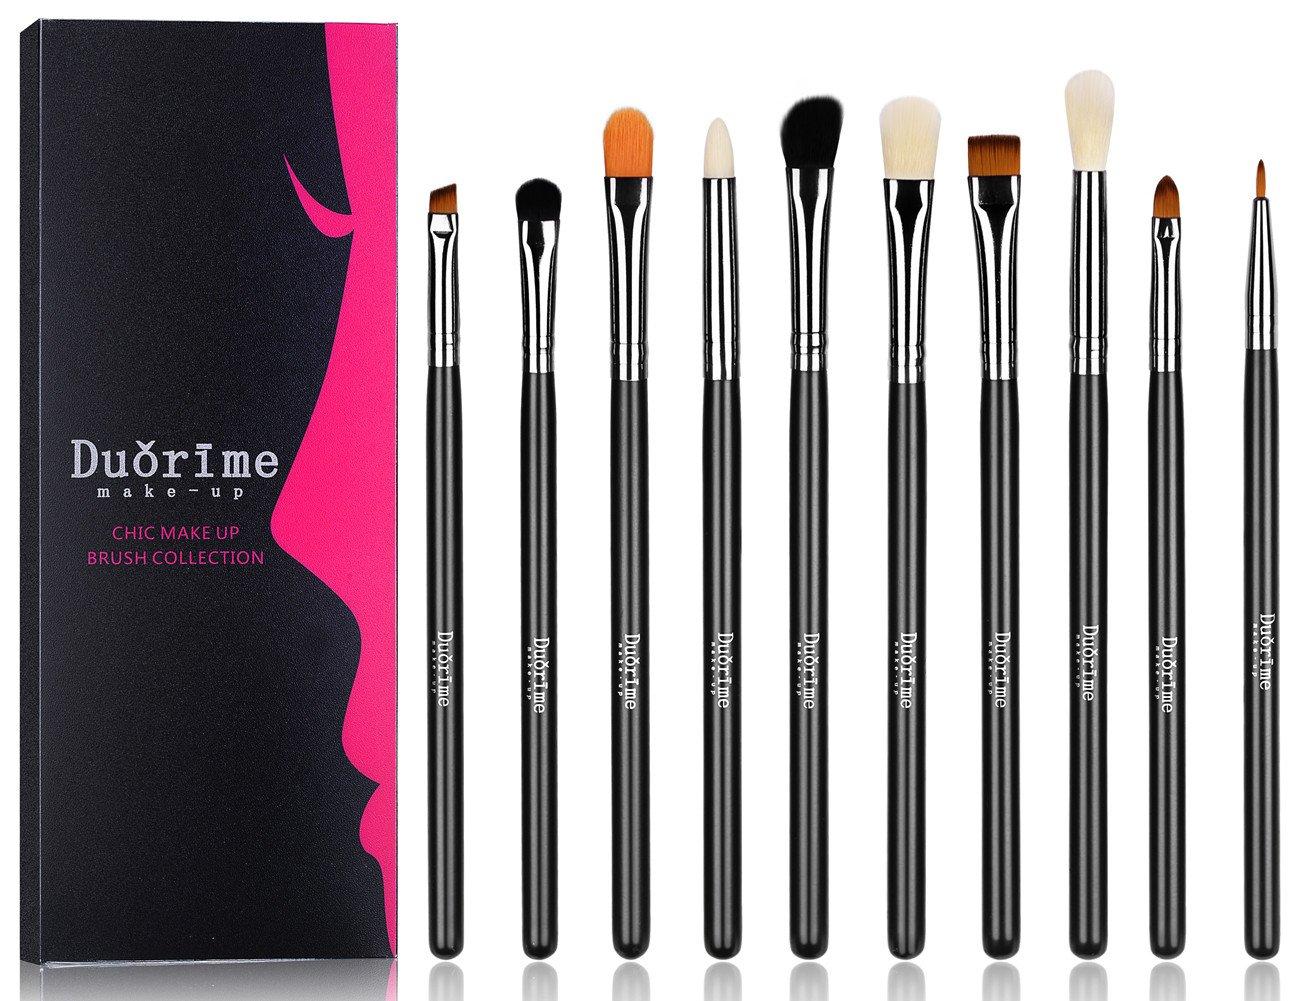 Duorime Makeup Brushes 10pcs Makeup Brush Kit for Foundation Eyeshadow Eyeliner Eyebrow Blending Lip Brush Set wooden handles